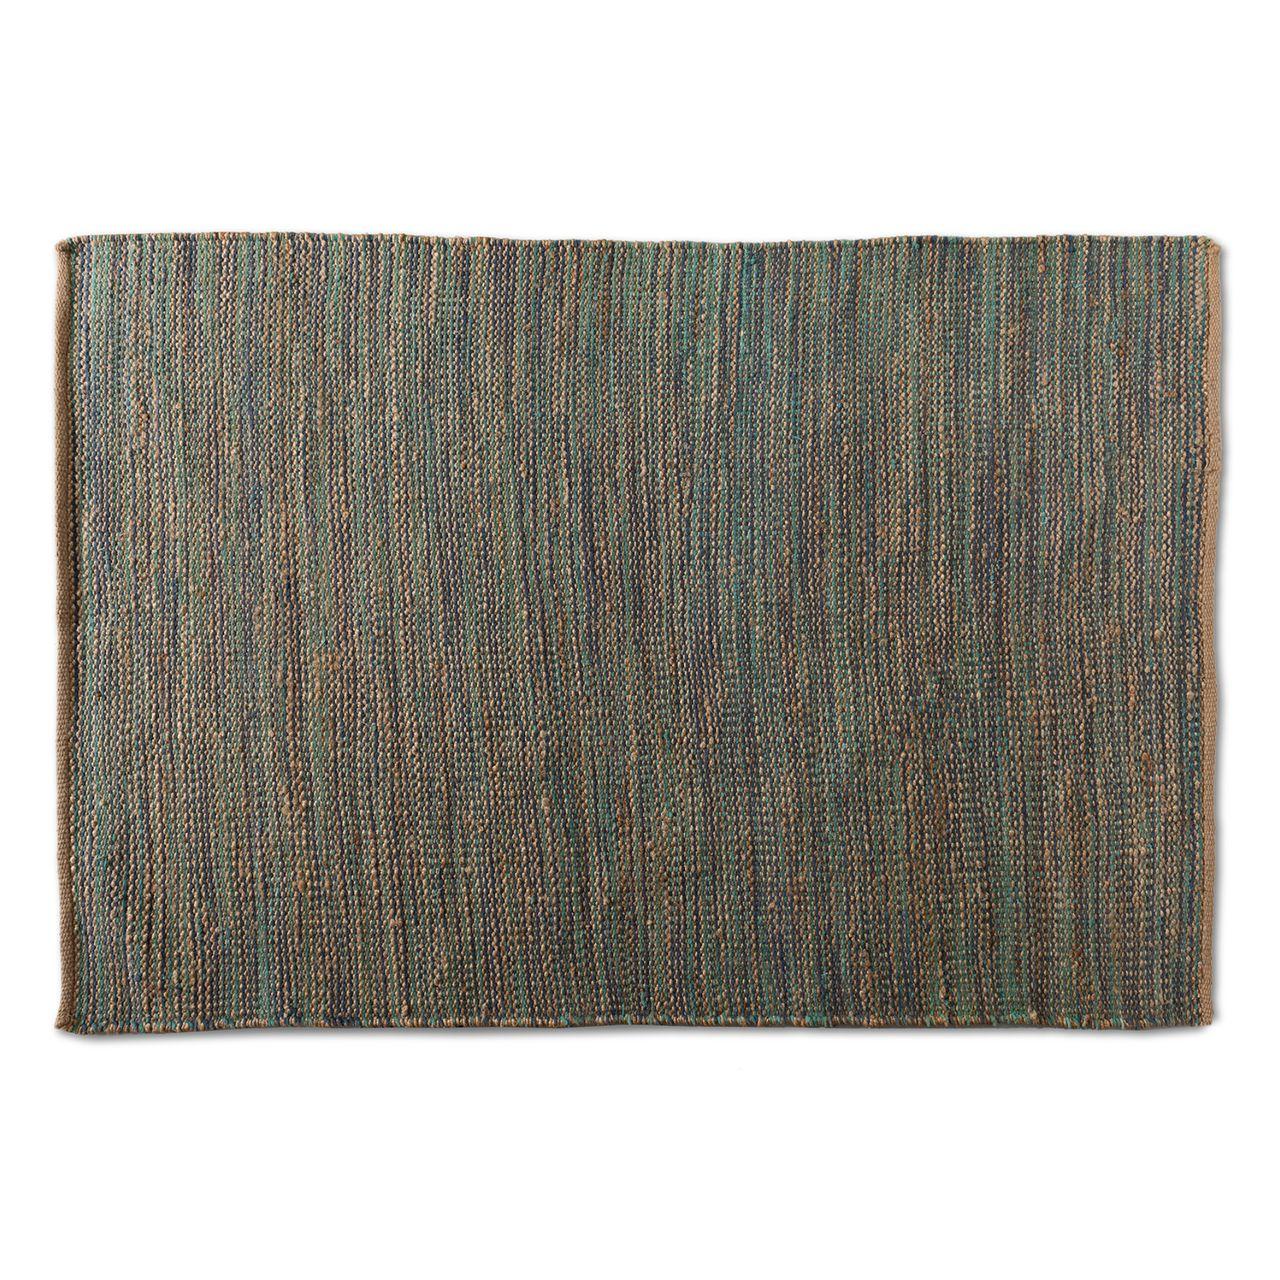 Baxton Studio Michigan Blue Handwoven Hemp Blend Area Rug